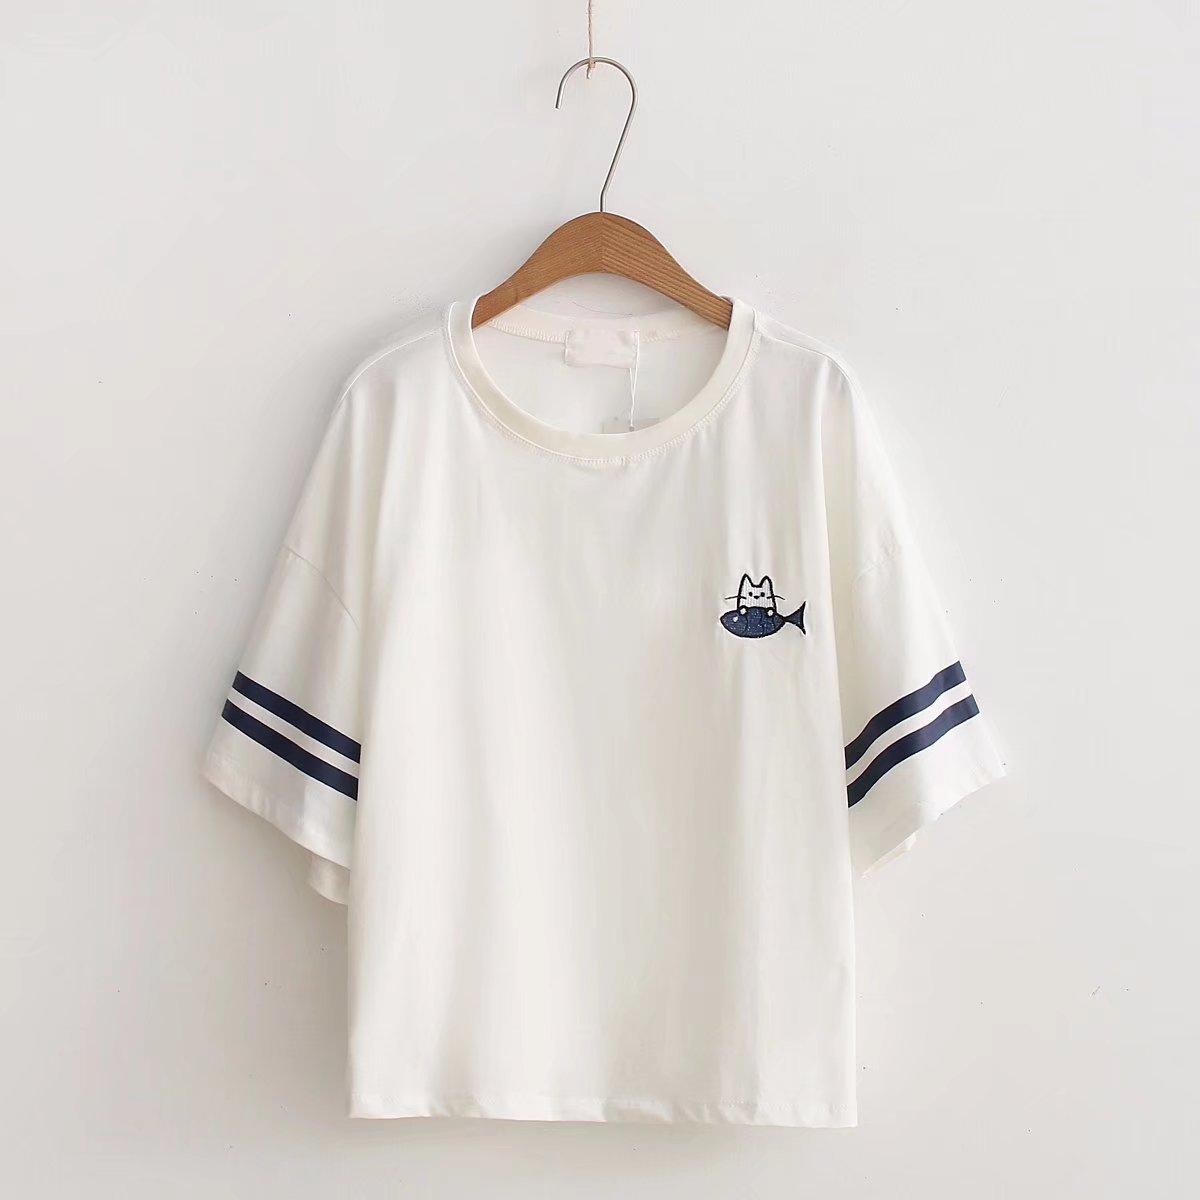 2019 de moda mujeres camiseta Casual divertido t camisa para mujer chica t camisa mujeres ropa